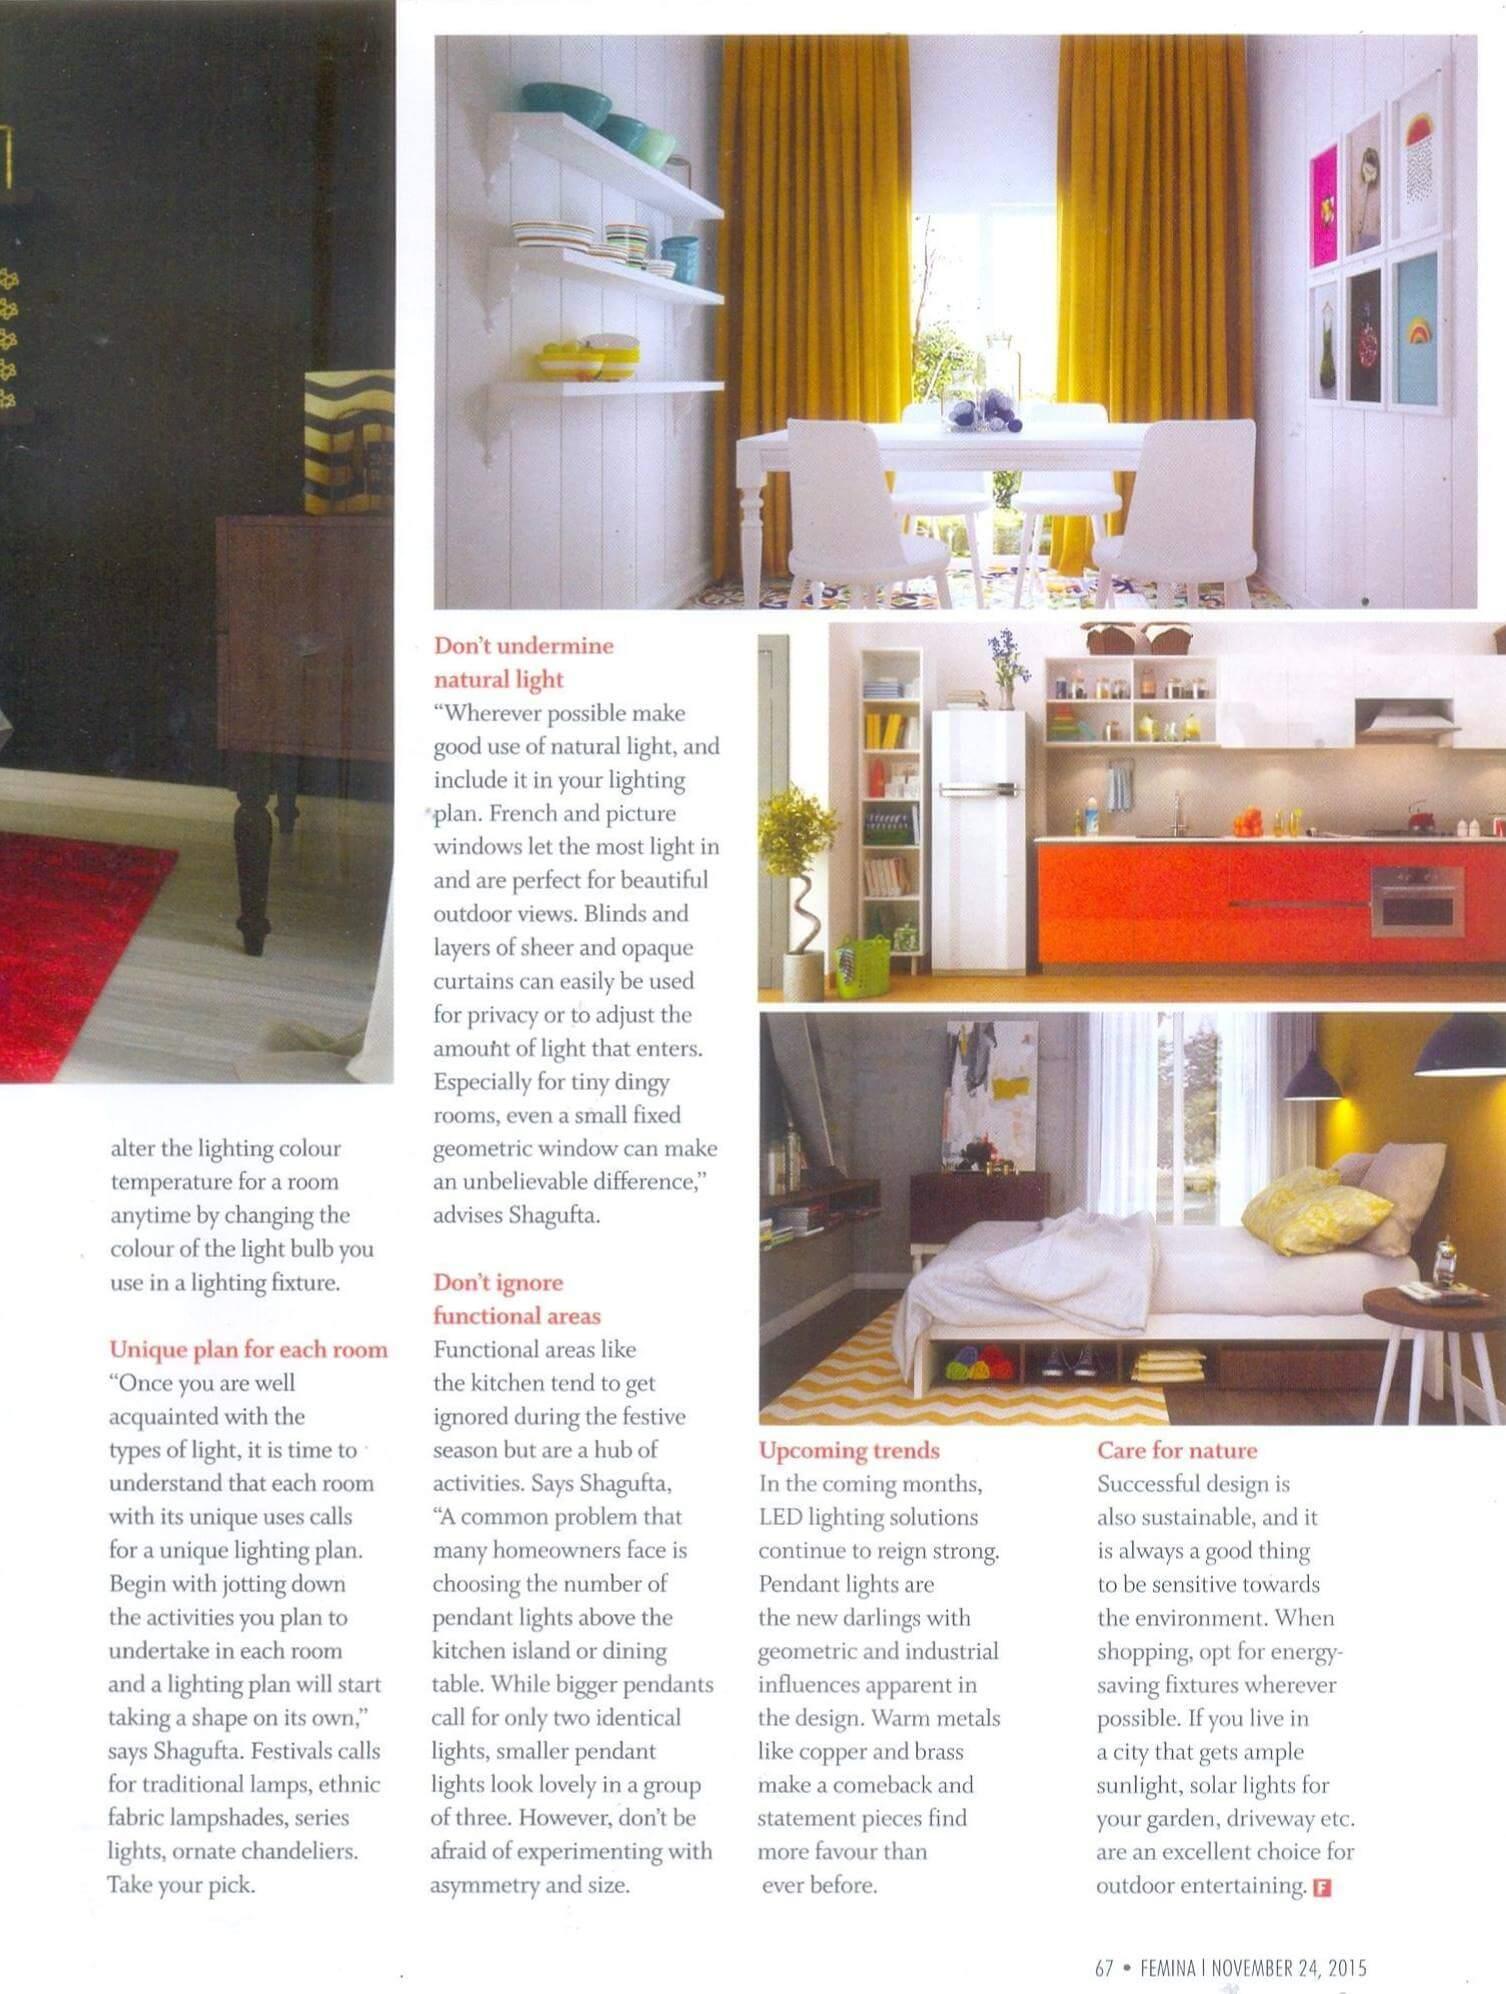 Livspace on Femina magazine